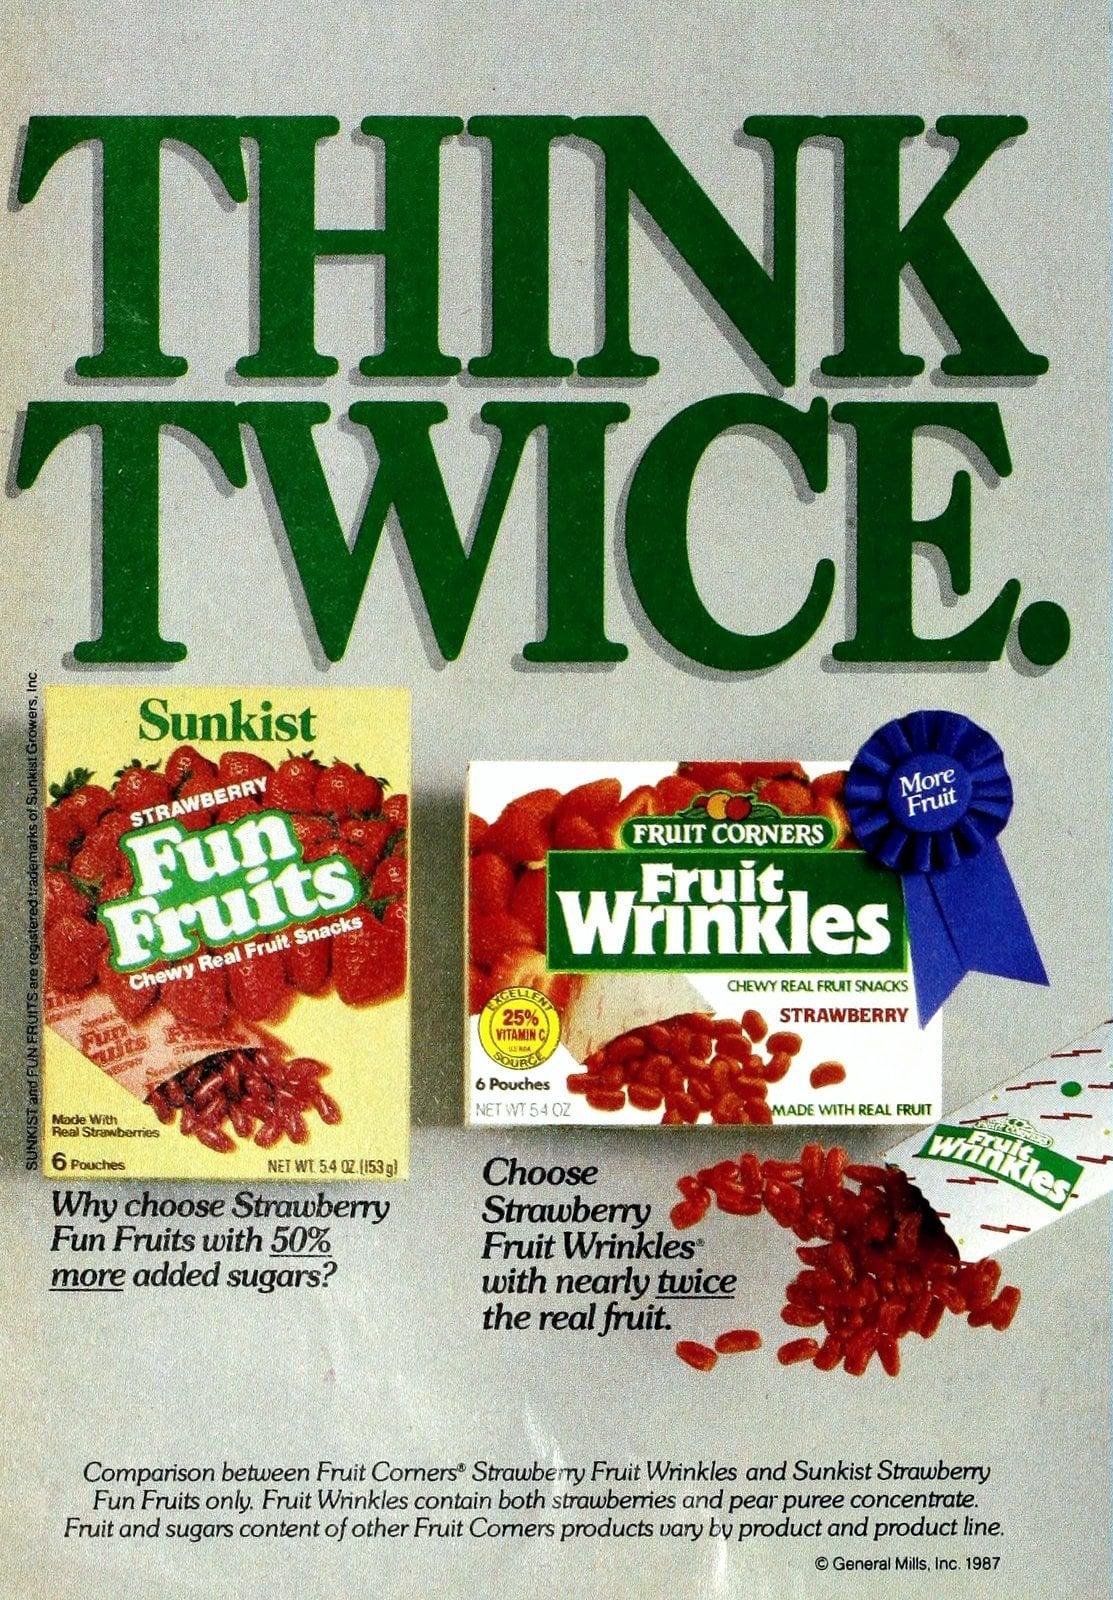 Vintage Sunkist Fun Fruits vs Fruit Corners Fruit Wrinkles (1987)